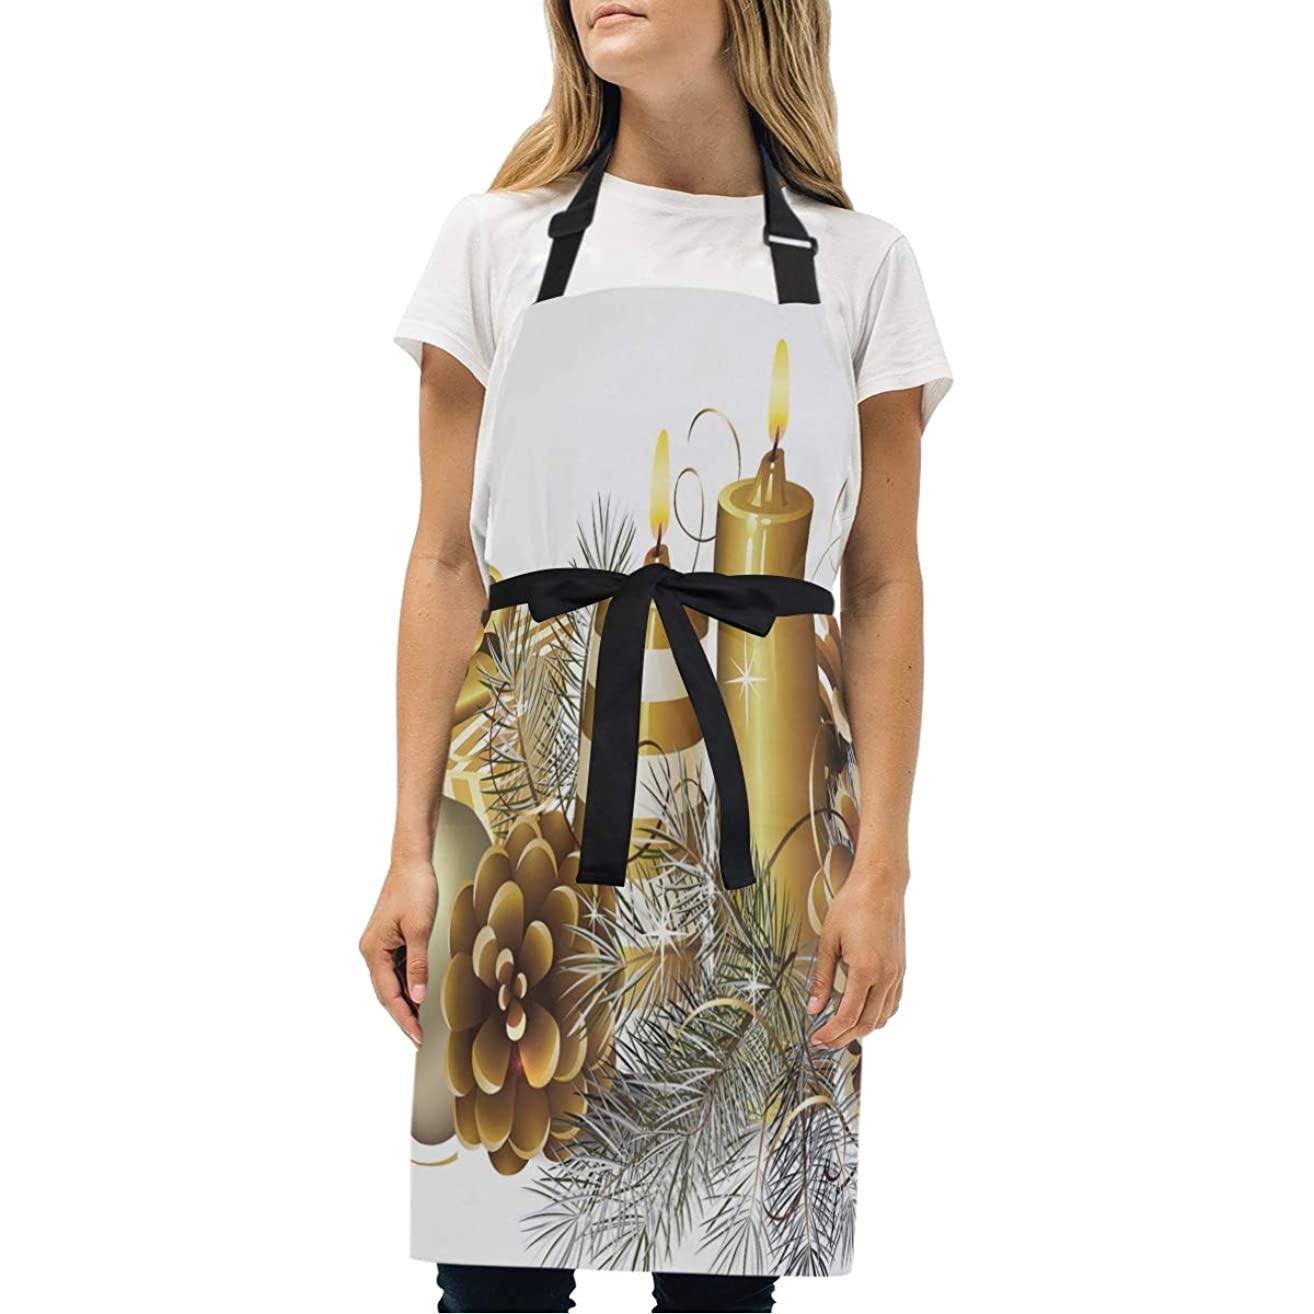 HJudge Womens Aprons Golden Kitchen Bib Aprons with Pockets Adjustable Buckle on Neck